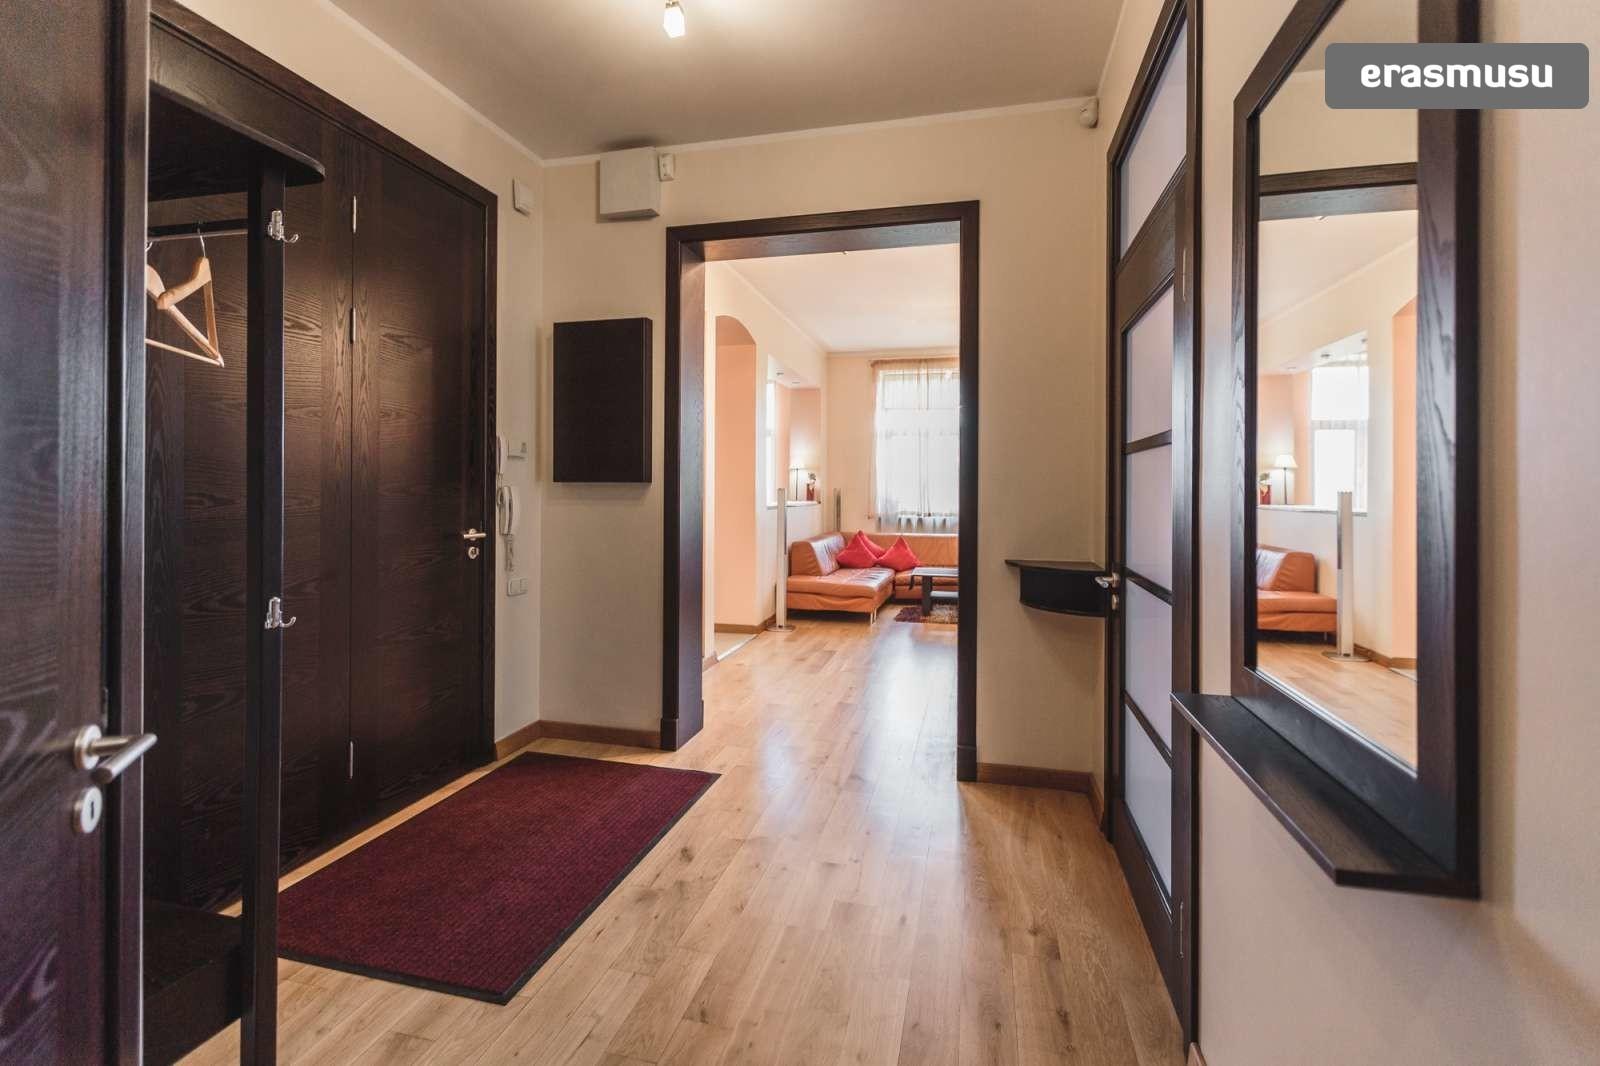 modern-4-bedroom-apartment-rent-centrs-2cebcfc0c505700e57ac29290